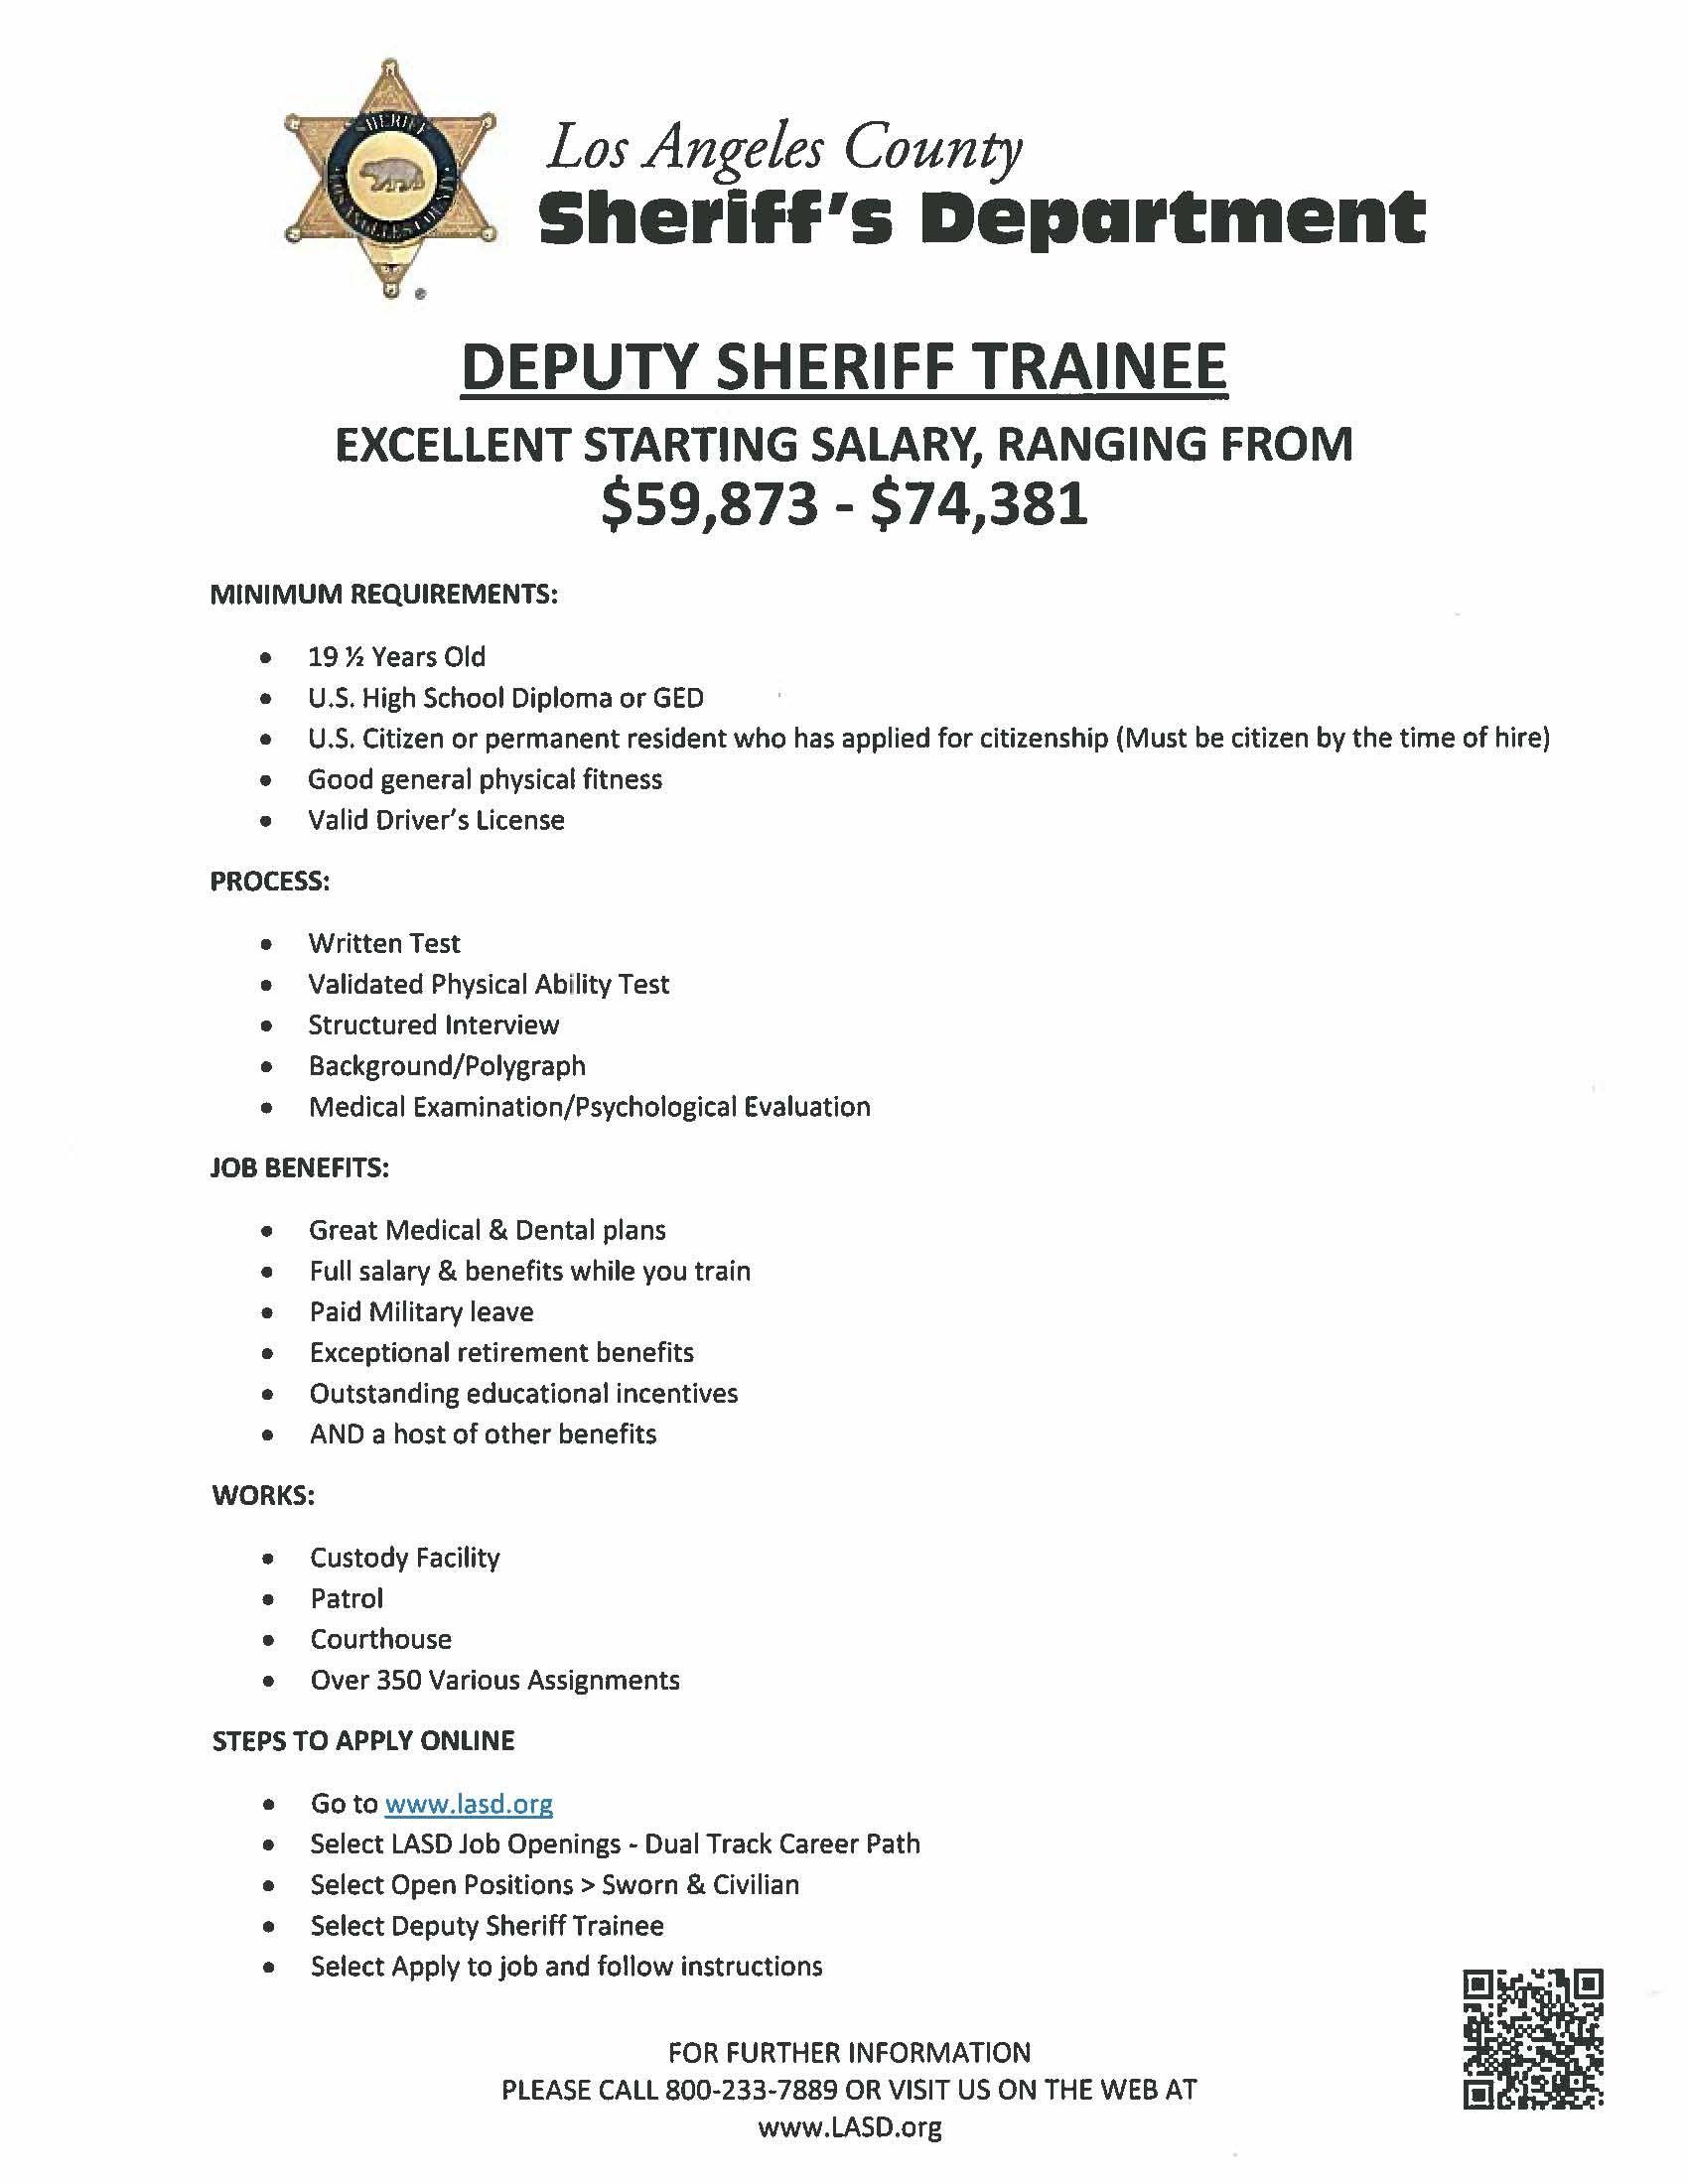 Deputy Sheriff Trainee! Need a job, High school diploma